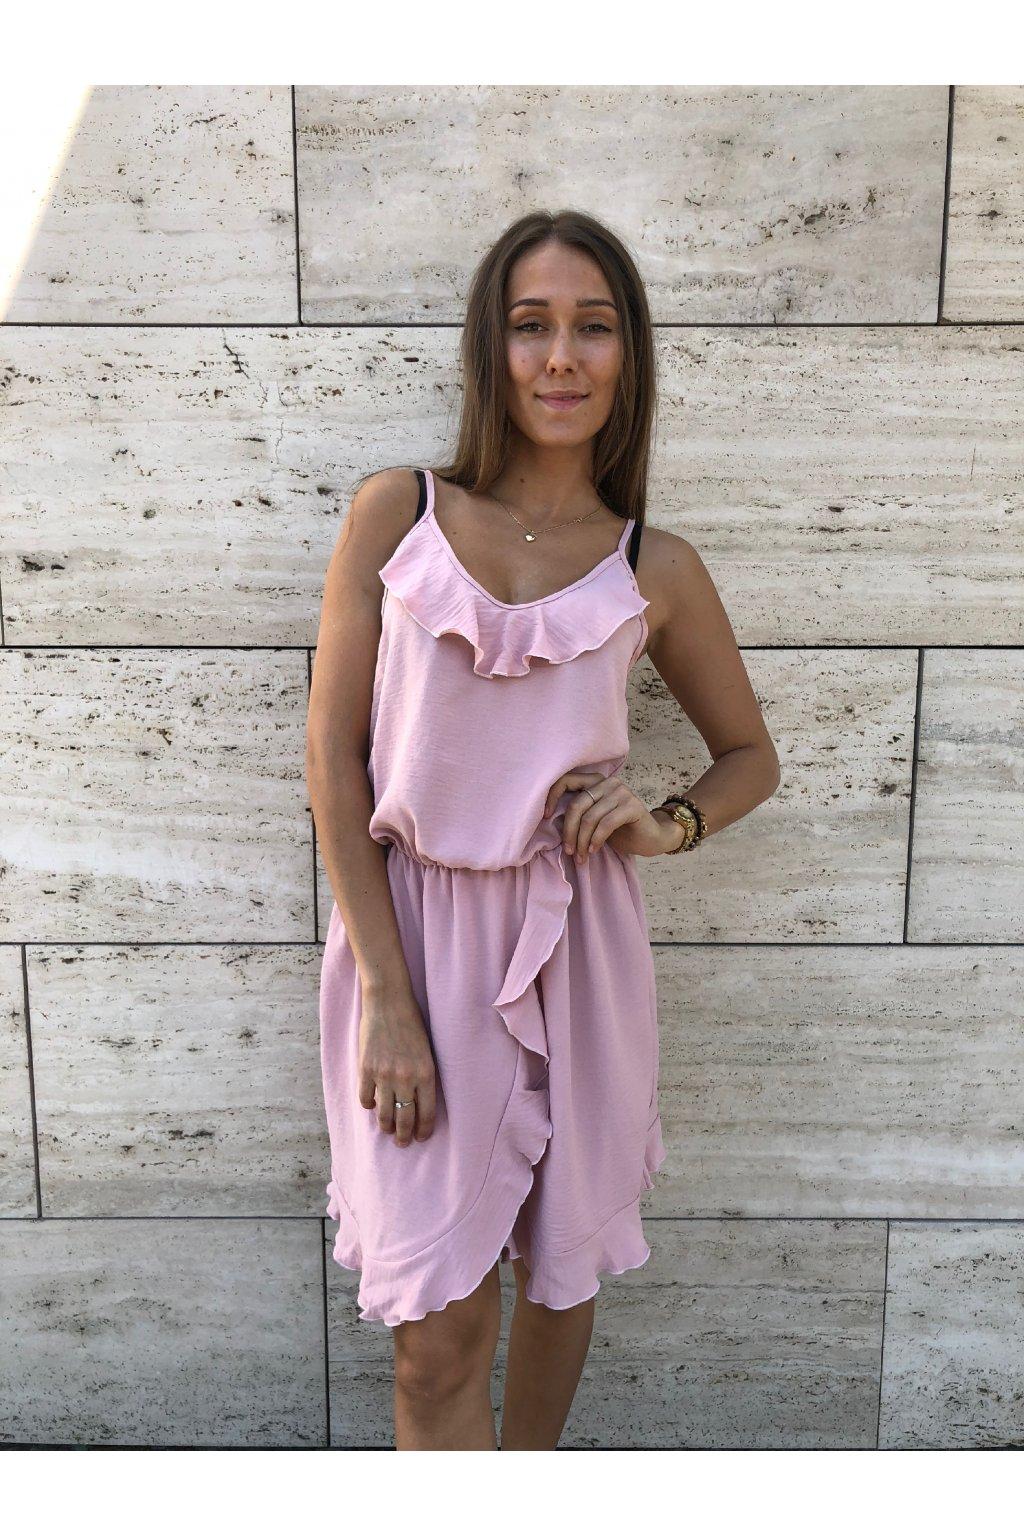 damske saty victoria pink eshopat cz 1